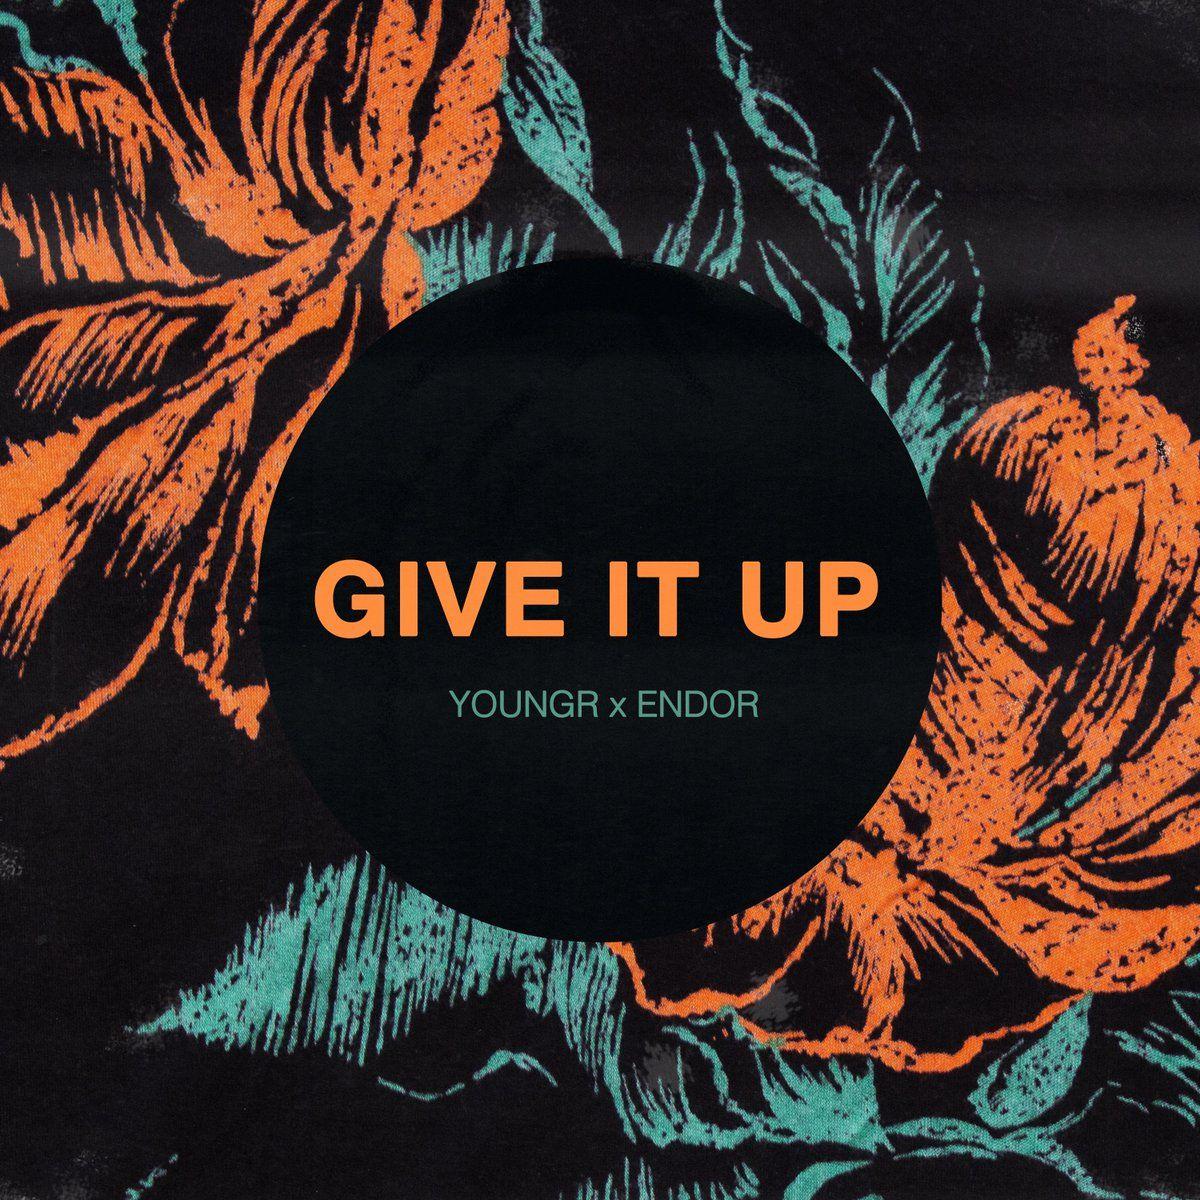 give_it_up_endor.jpg